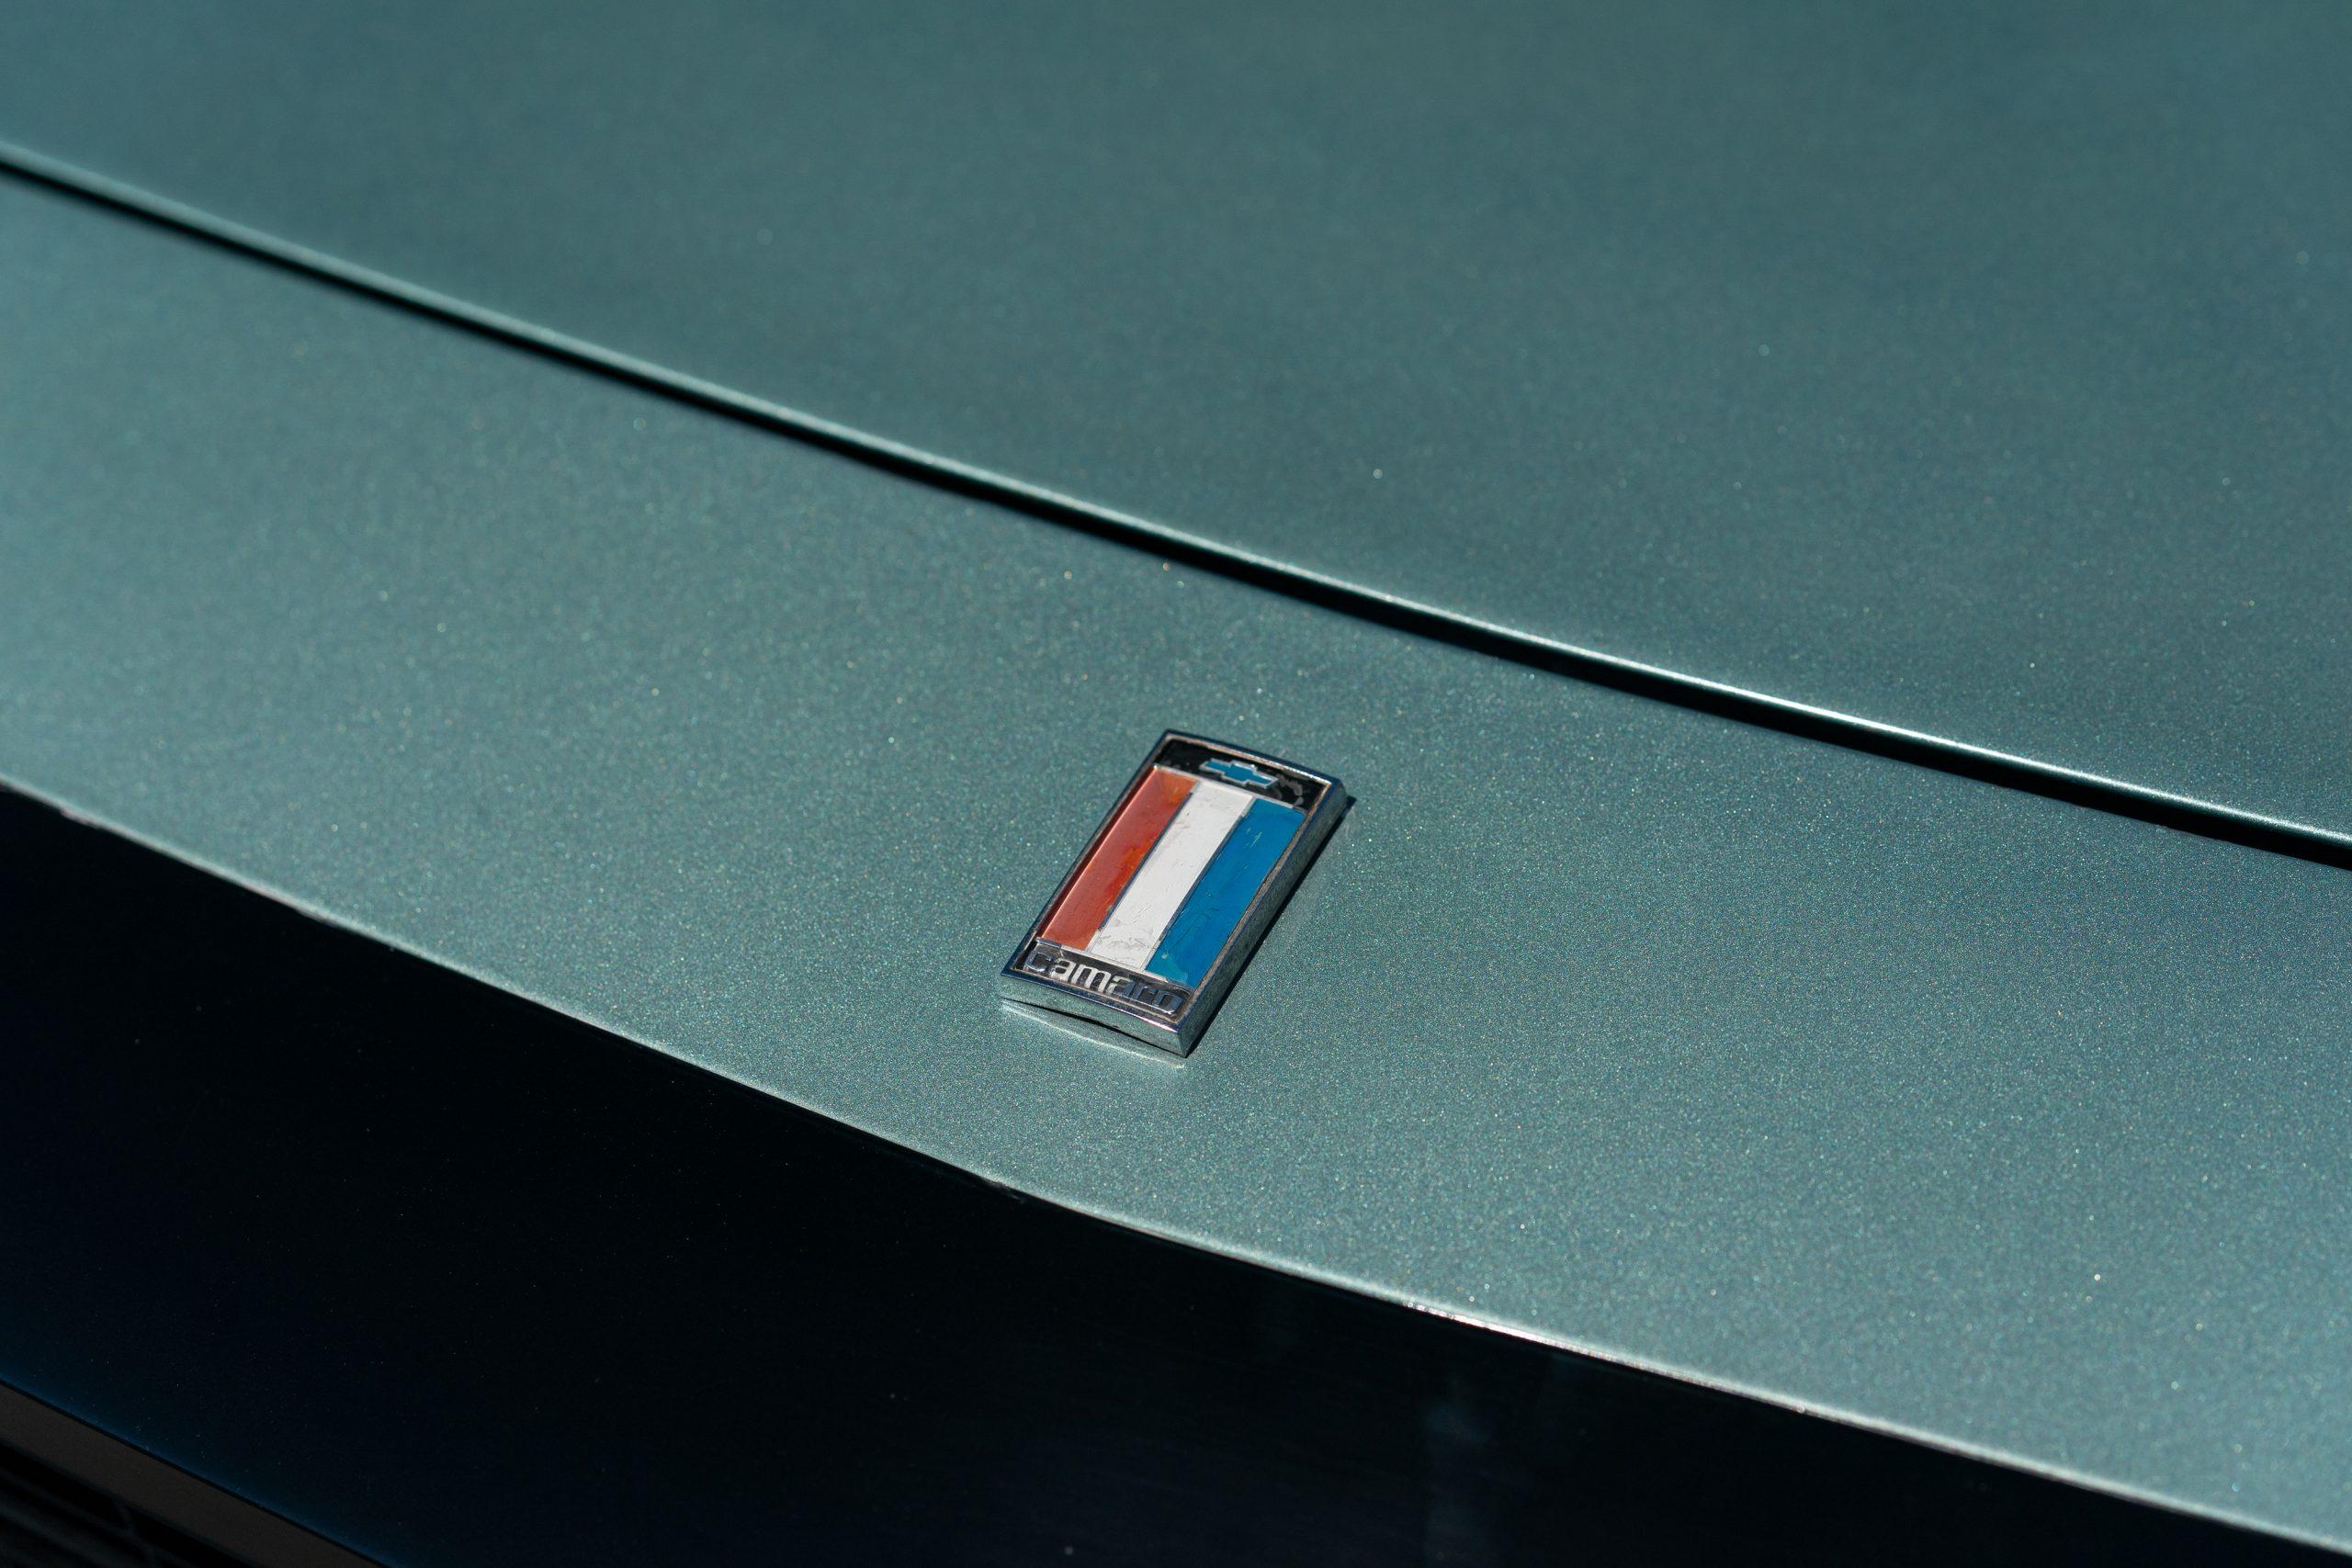 Europo Hurst camaro front badge